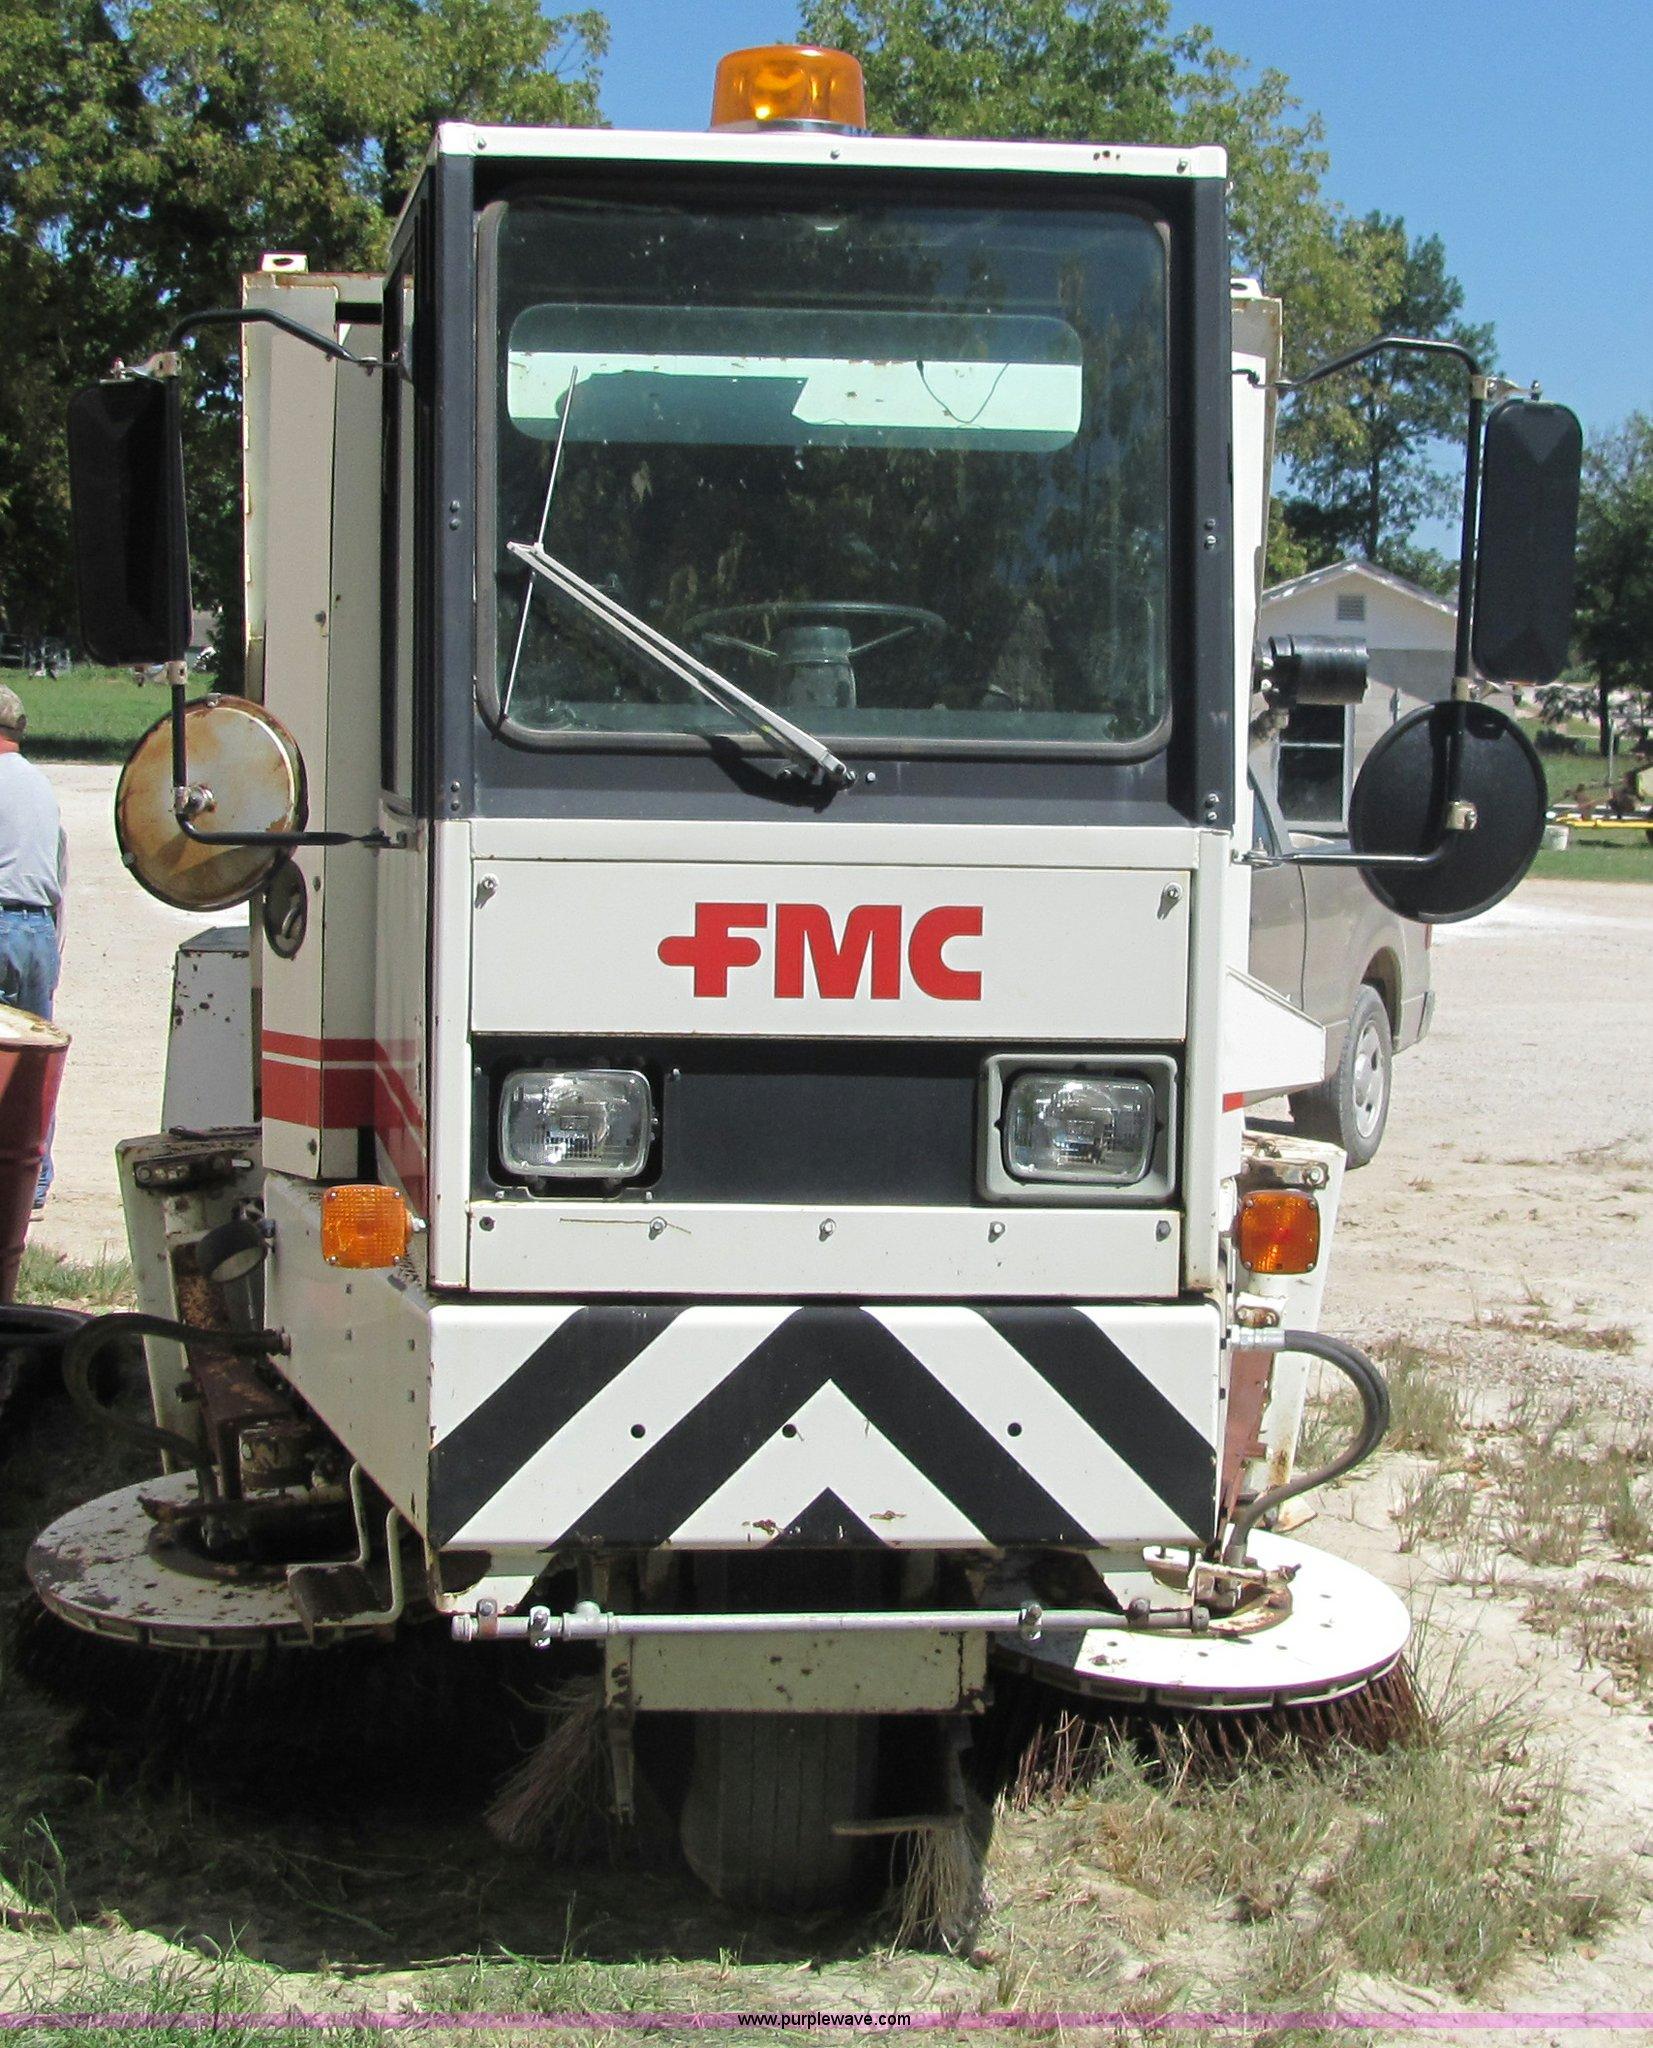 1988 fmc vanguard v3000 street sweeper item 6832 sold s rh purplewave com Tymco 500X Sweeper Tymco 500X Sweeper